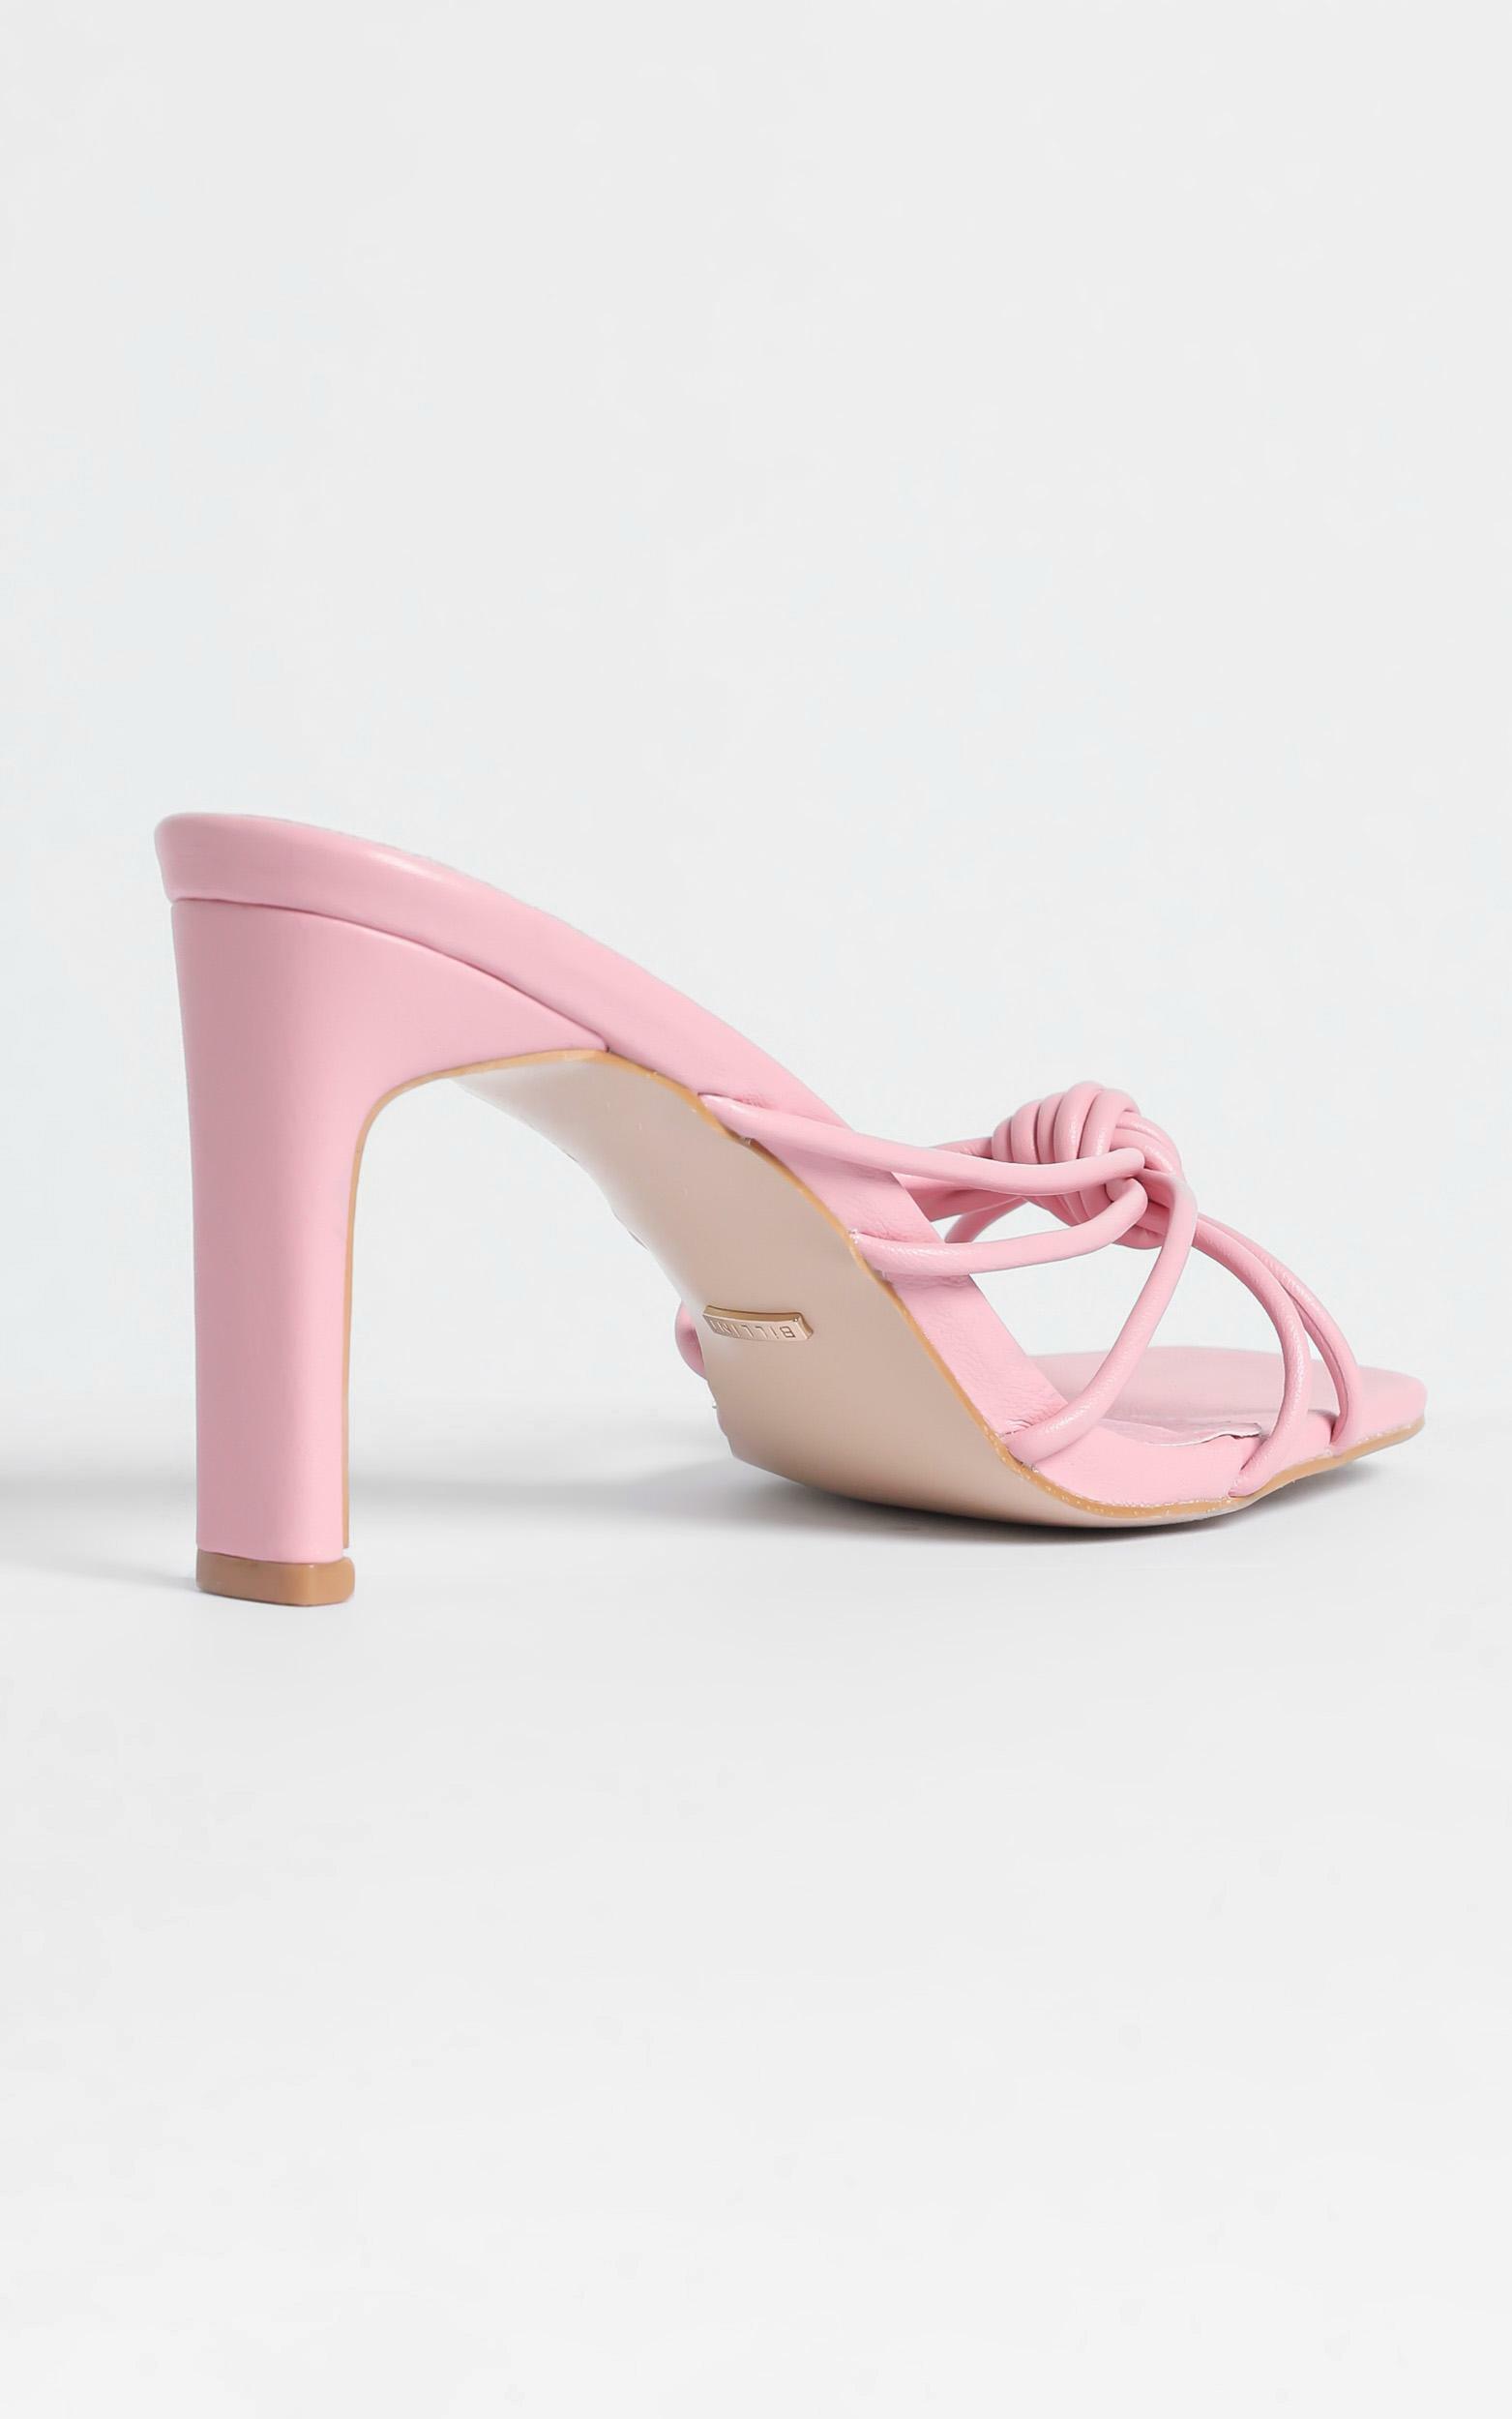 Billini - Posse Heels in Watermelon - 5, Pink, hi-res image number null